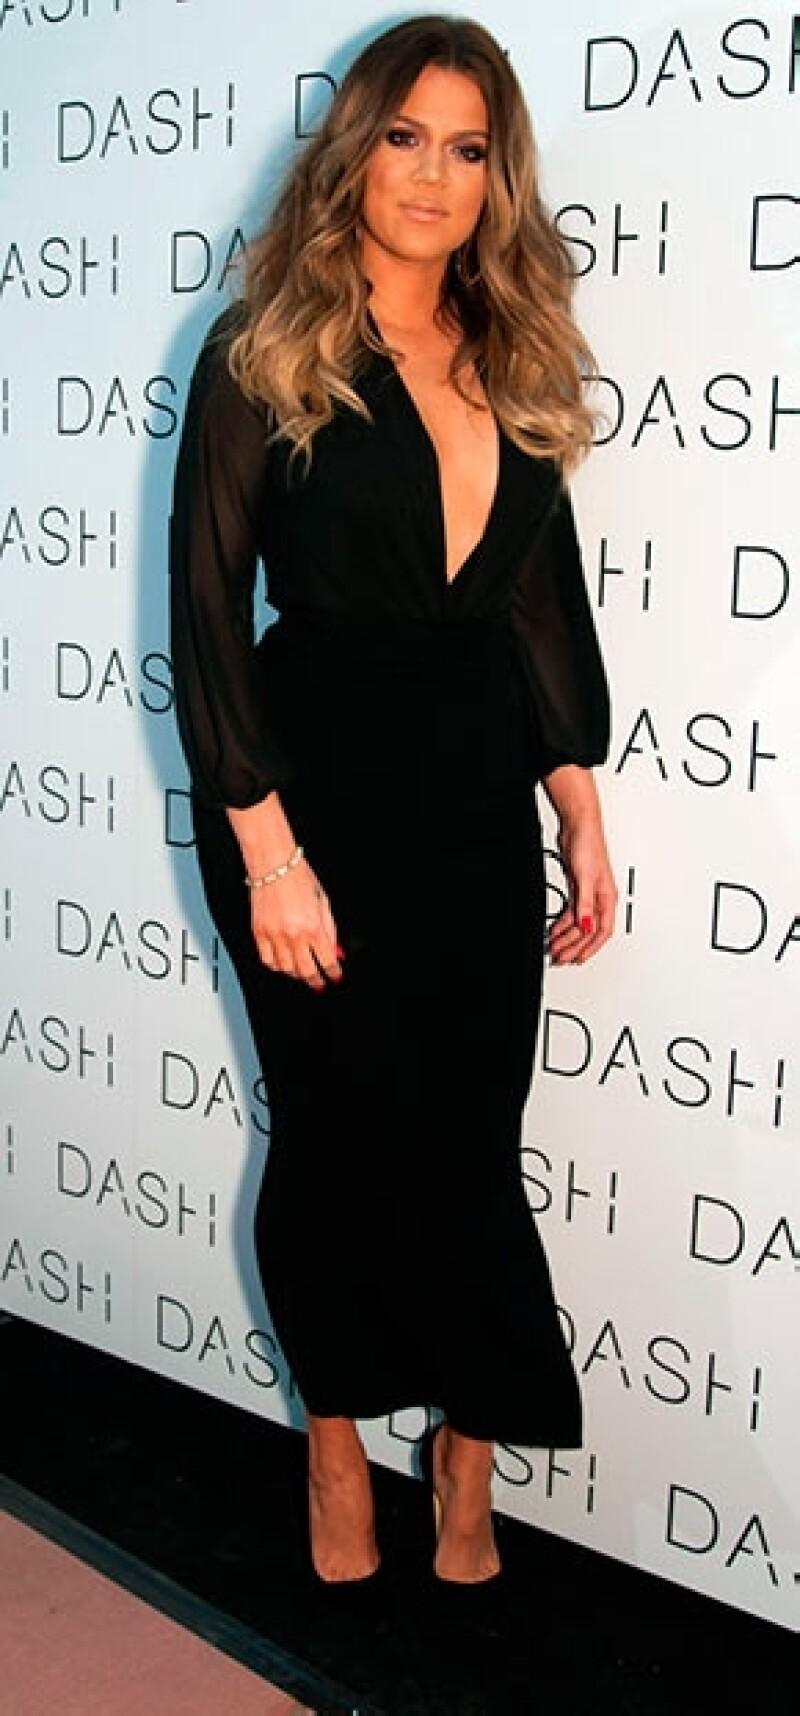 Khloé Kardashian usa collar con nombre de su supuesto nuevo novio a3a66568e11